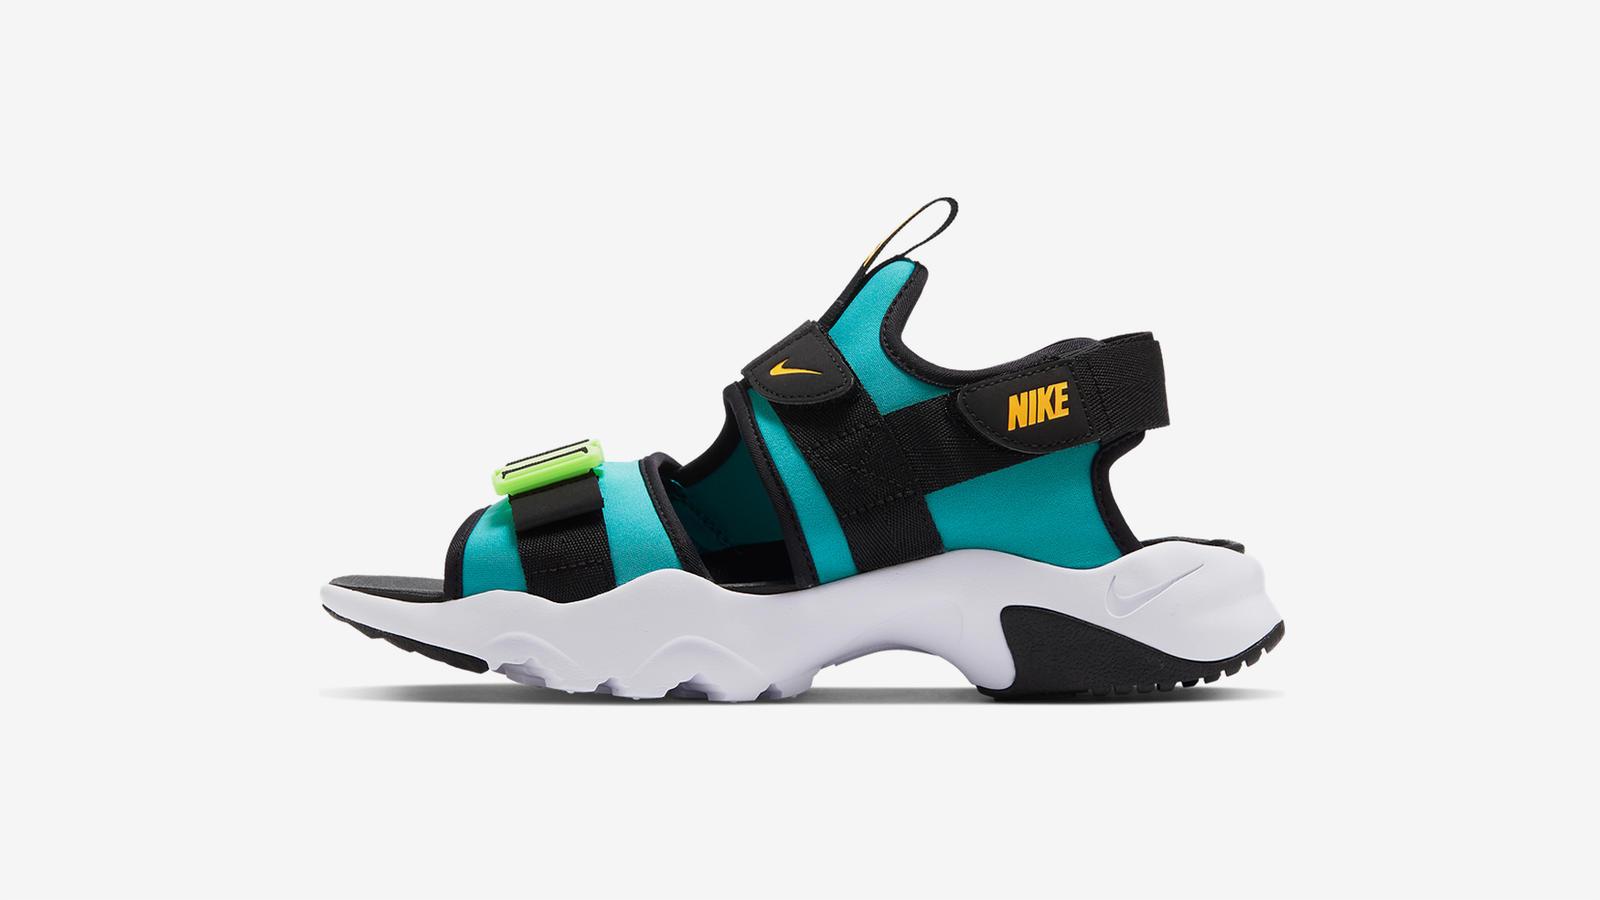 Nike Sportswear Summer 2020 Sandals Nike Canyon Nike Asuna Nike Owaysis 8